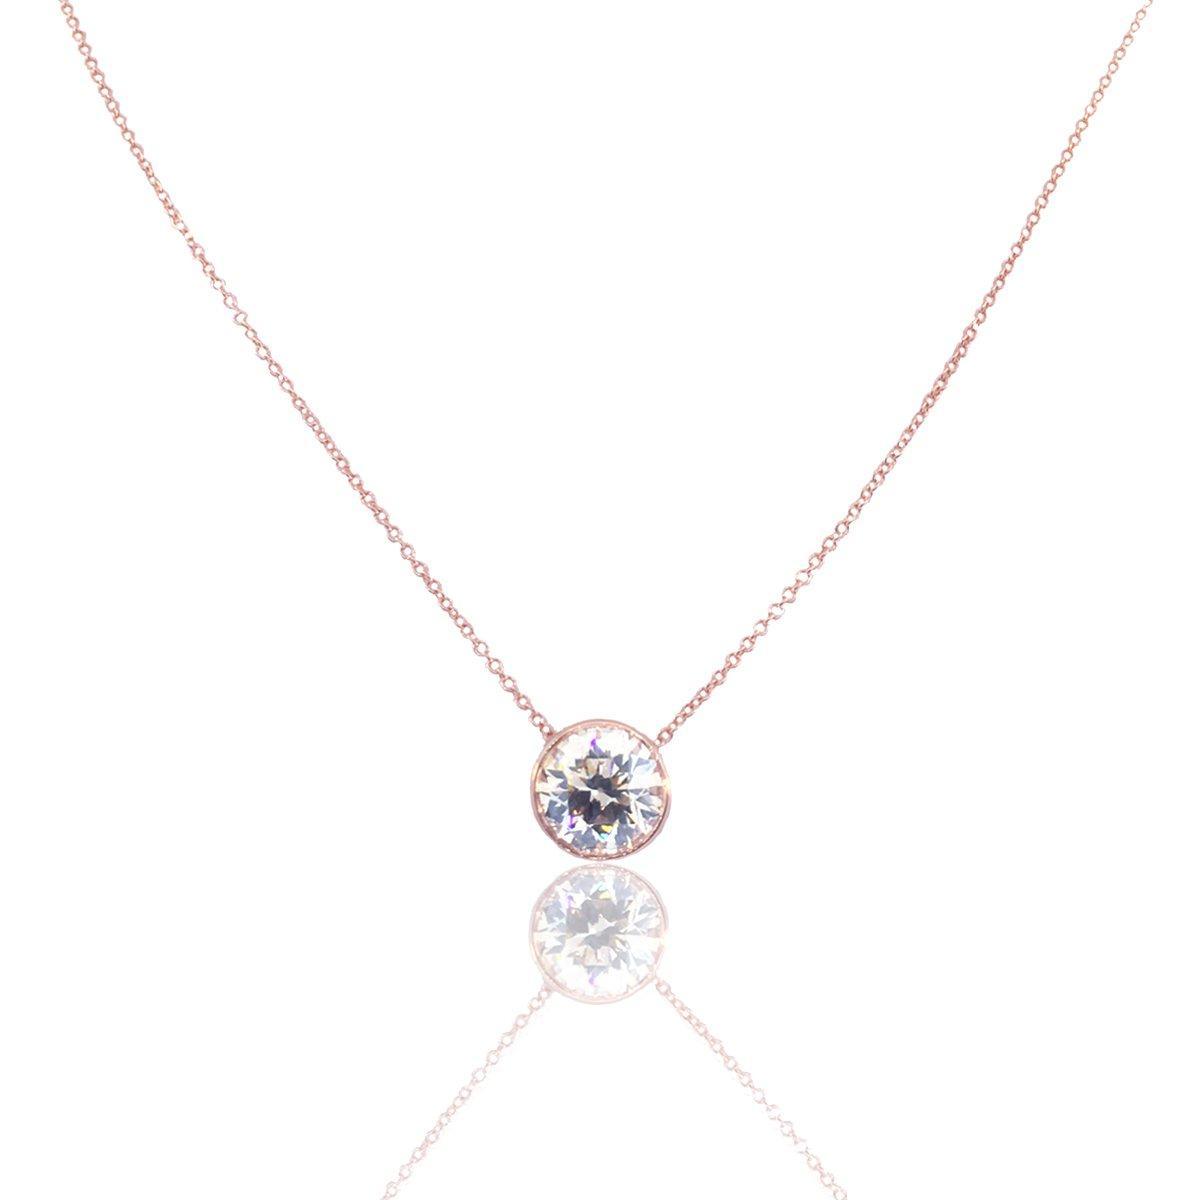 47da1017e Rose Gold, Bezel Set, Diamond Pendant, NY Diamond District, Best Diamond  Value